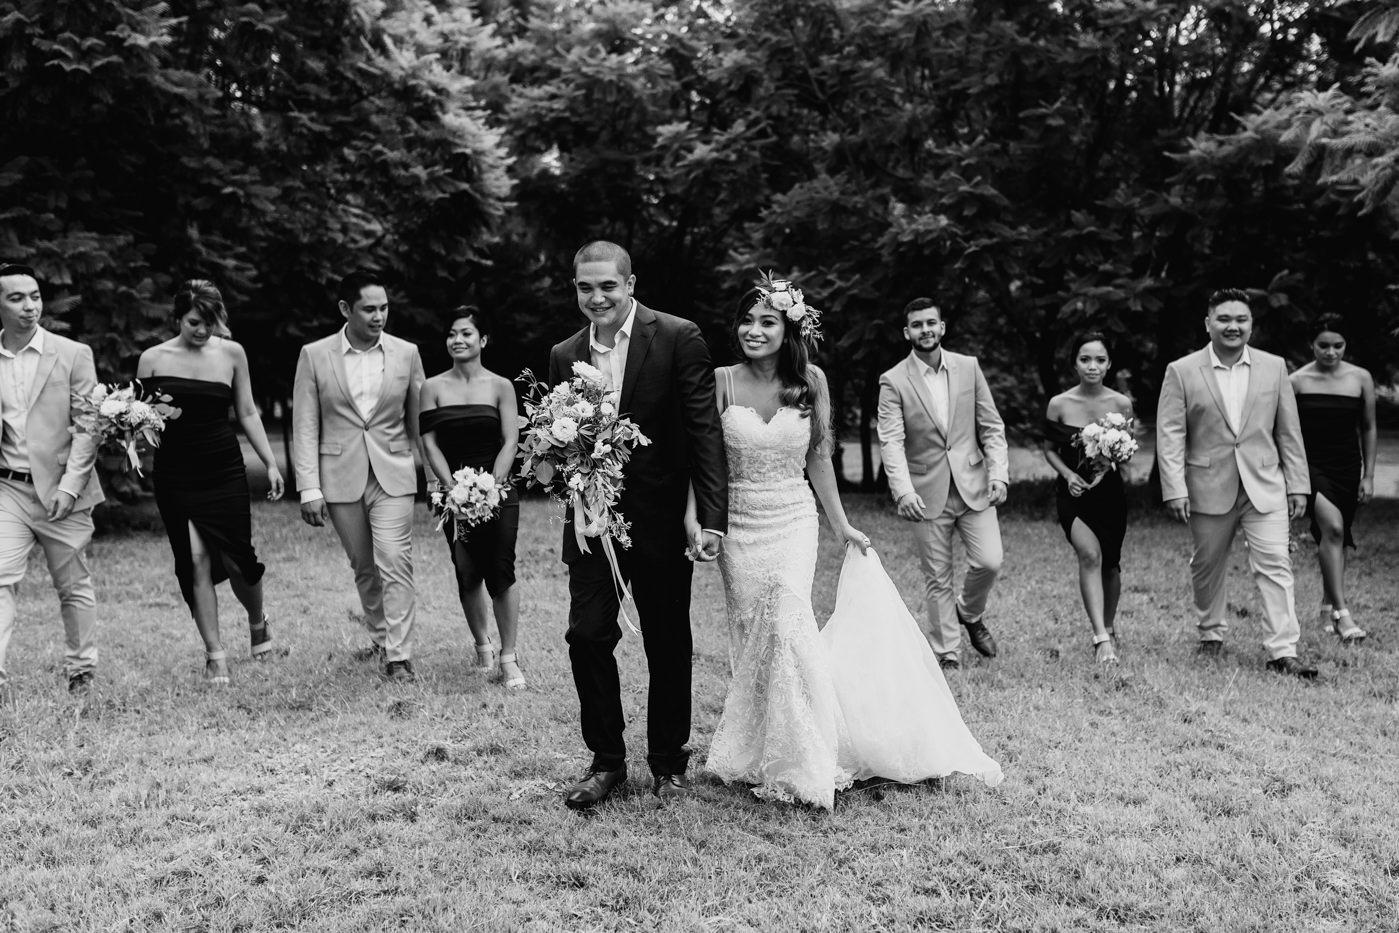 Nick & Vanezza - Fernbank Farm Wedding - Samantha Heather Photography-92.jpg